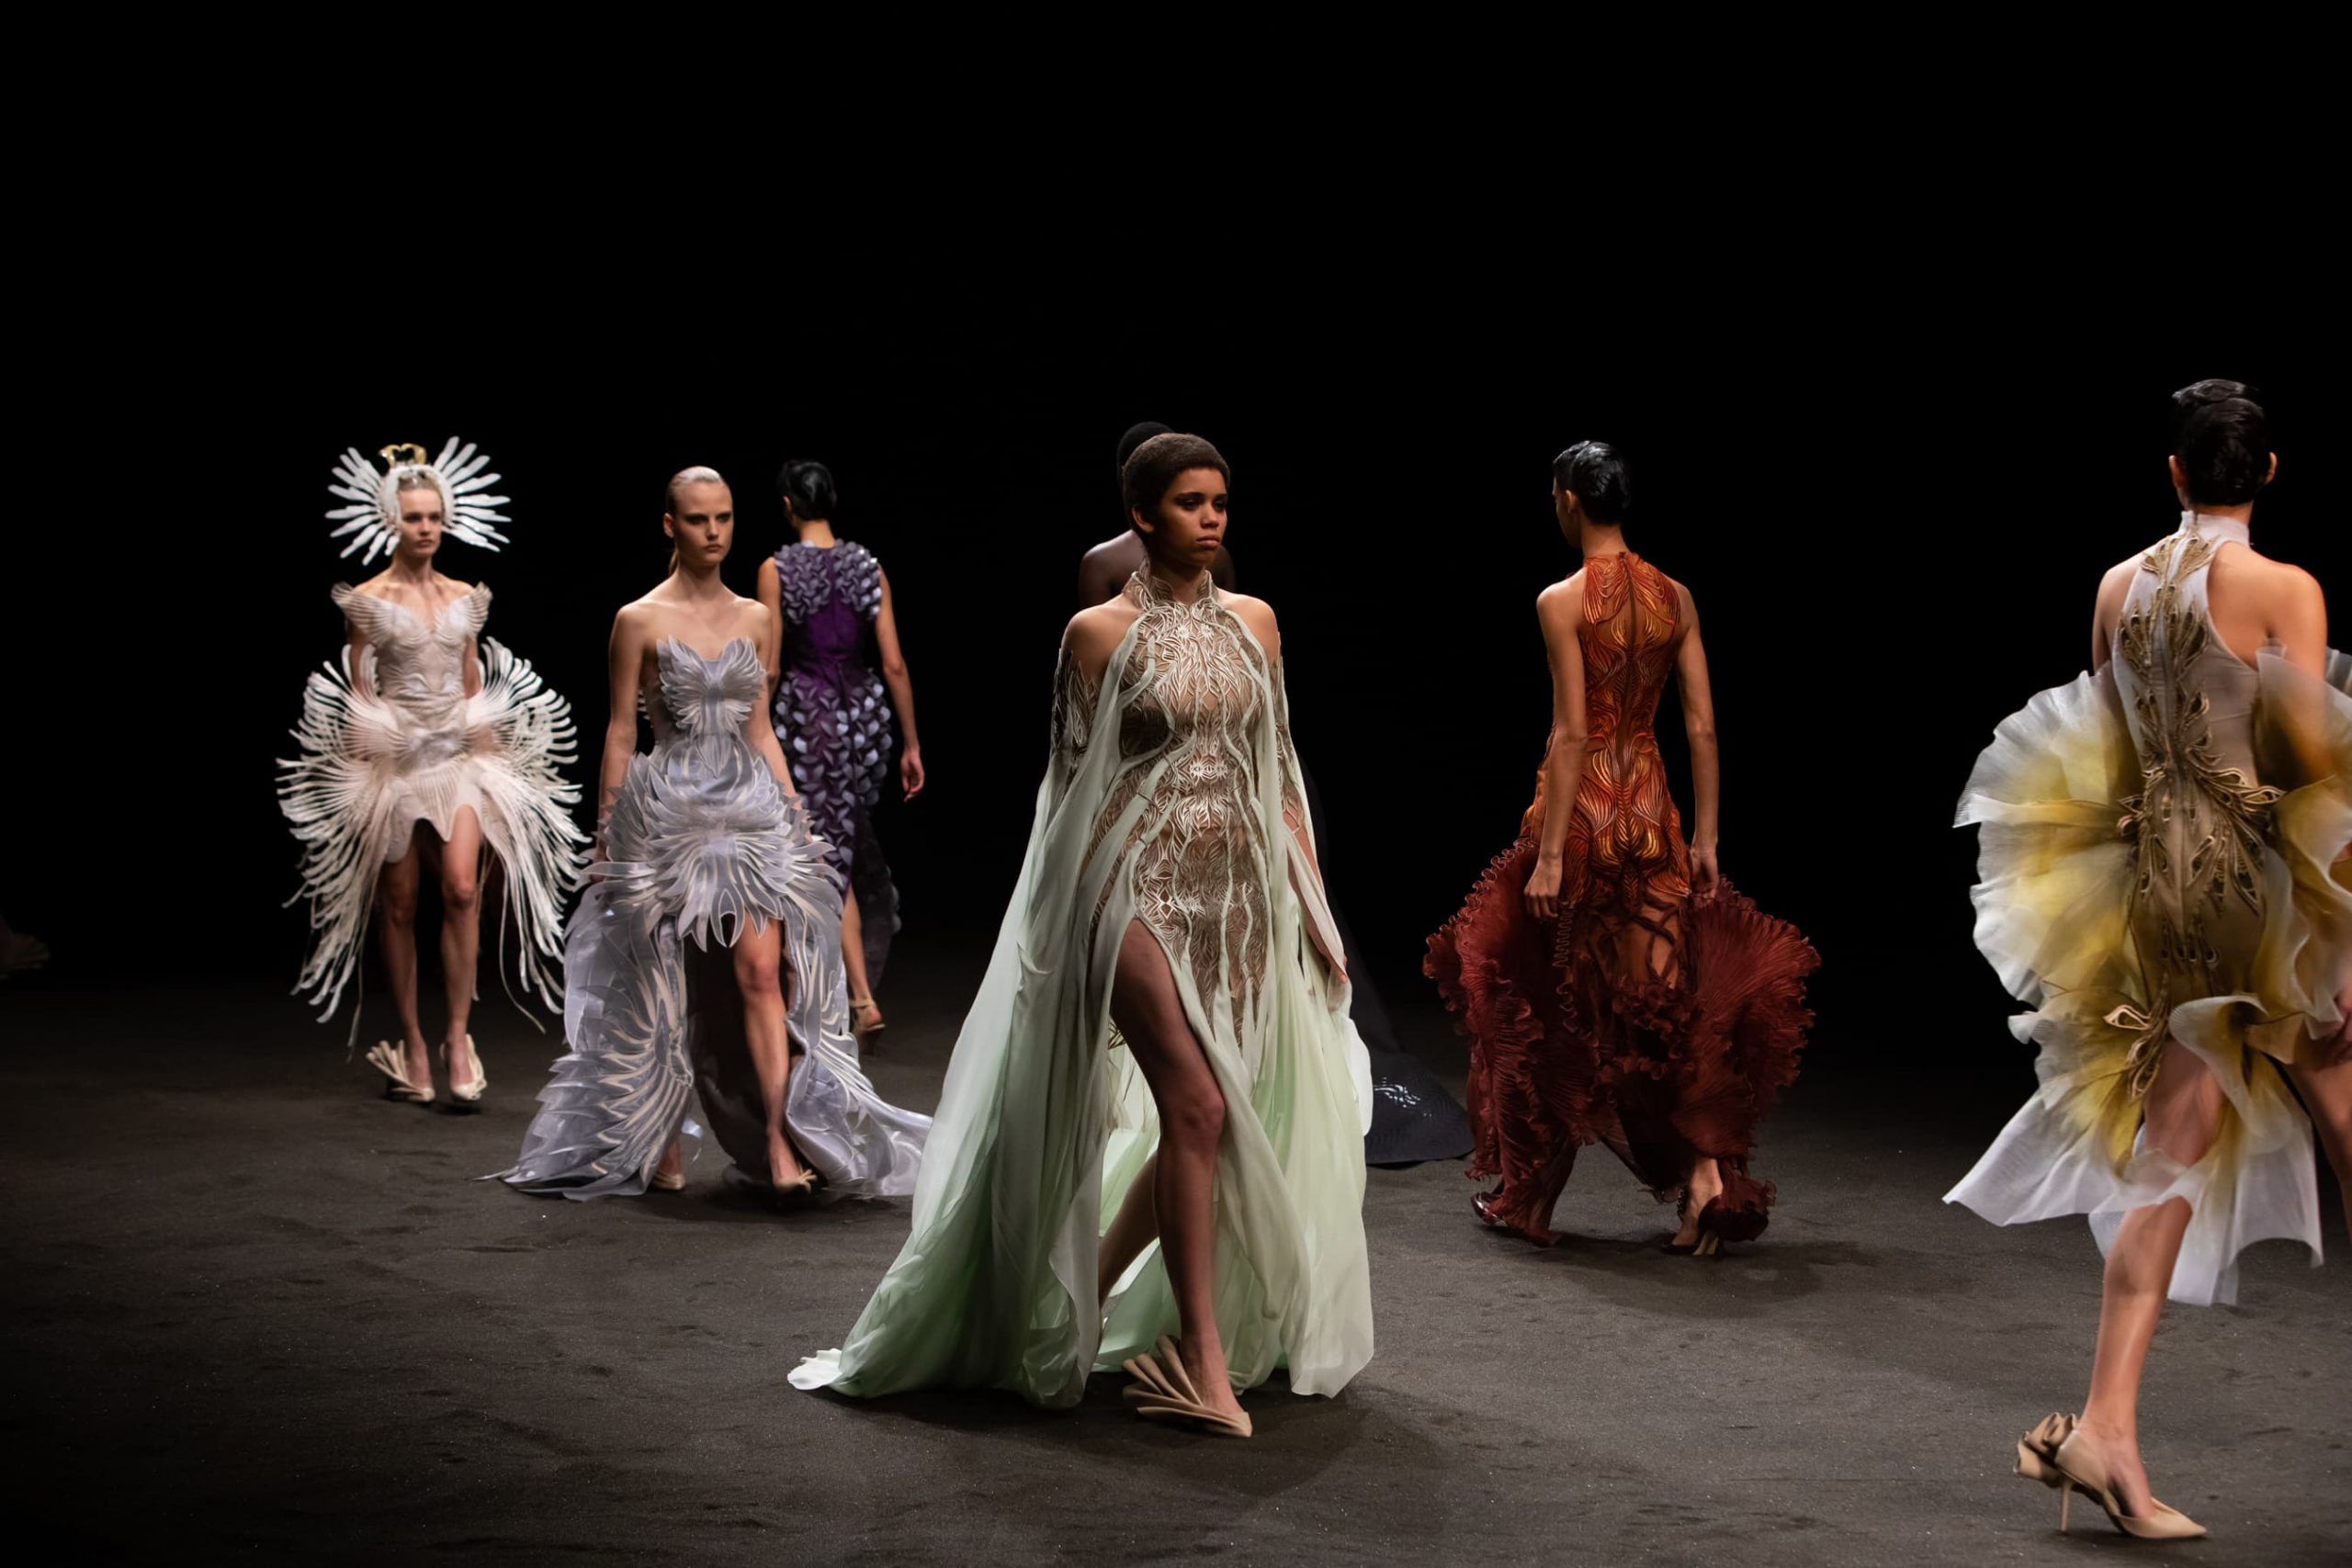 Review of Iris Van Herpen, Schiaparelli, Julie de Libran, Giambattista Valli Spring 2021 Haute Couture Fashion Shows